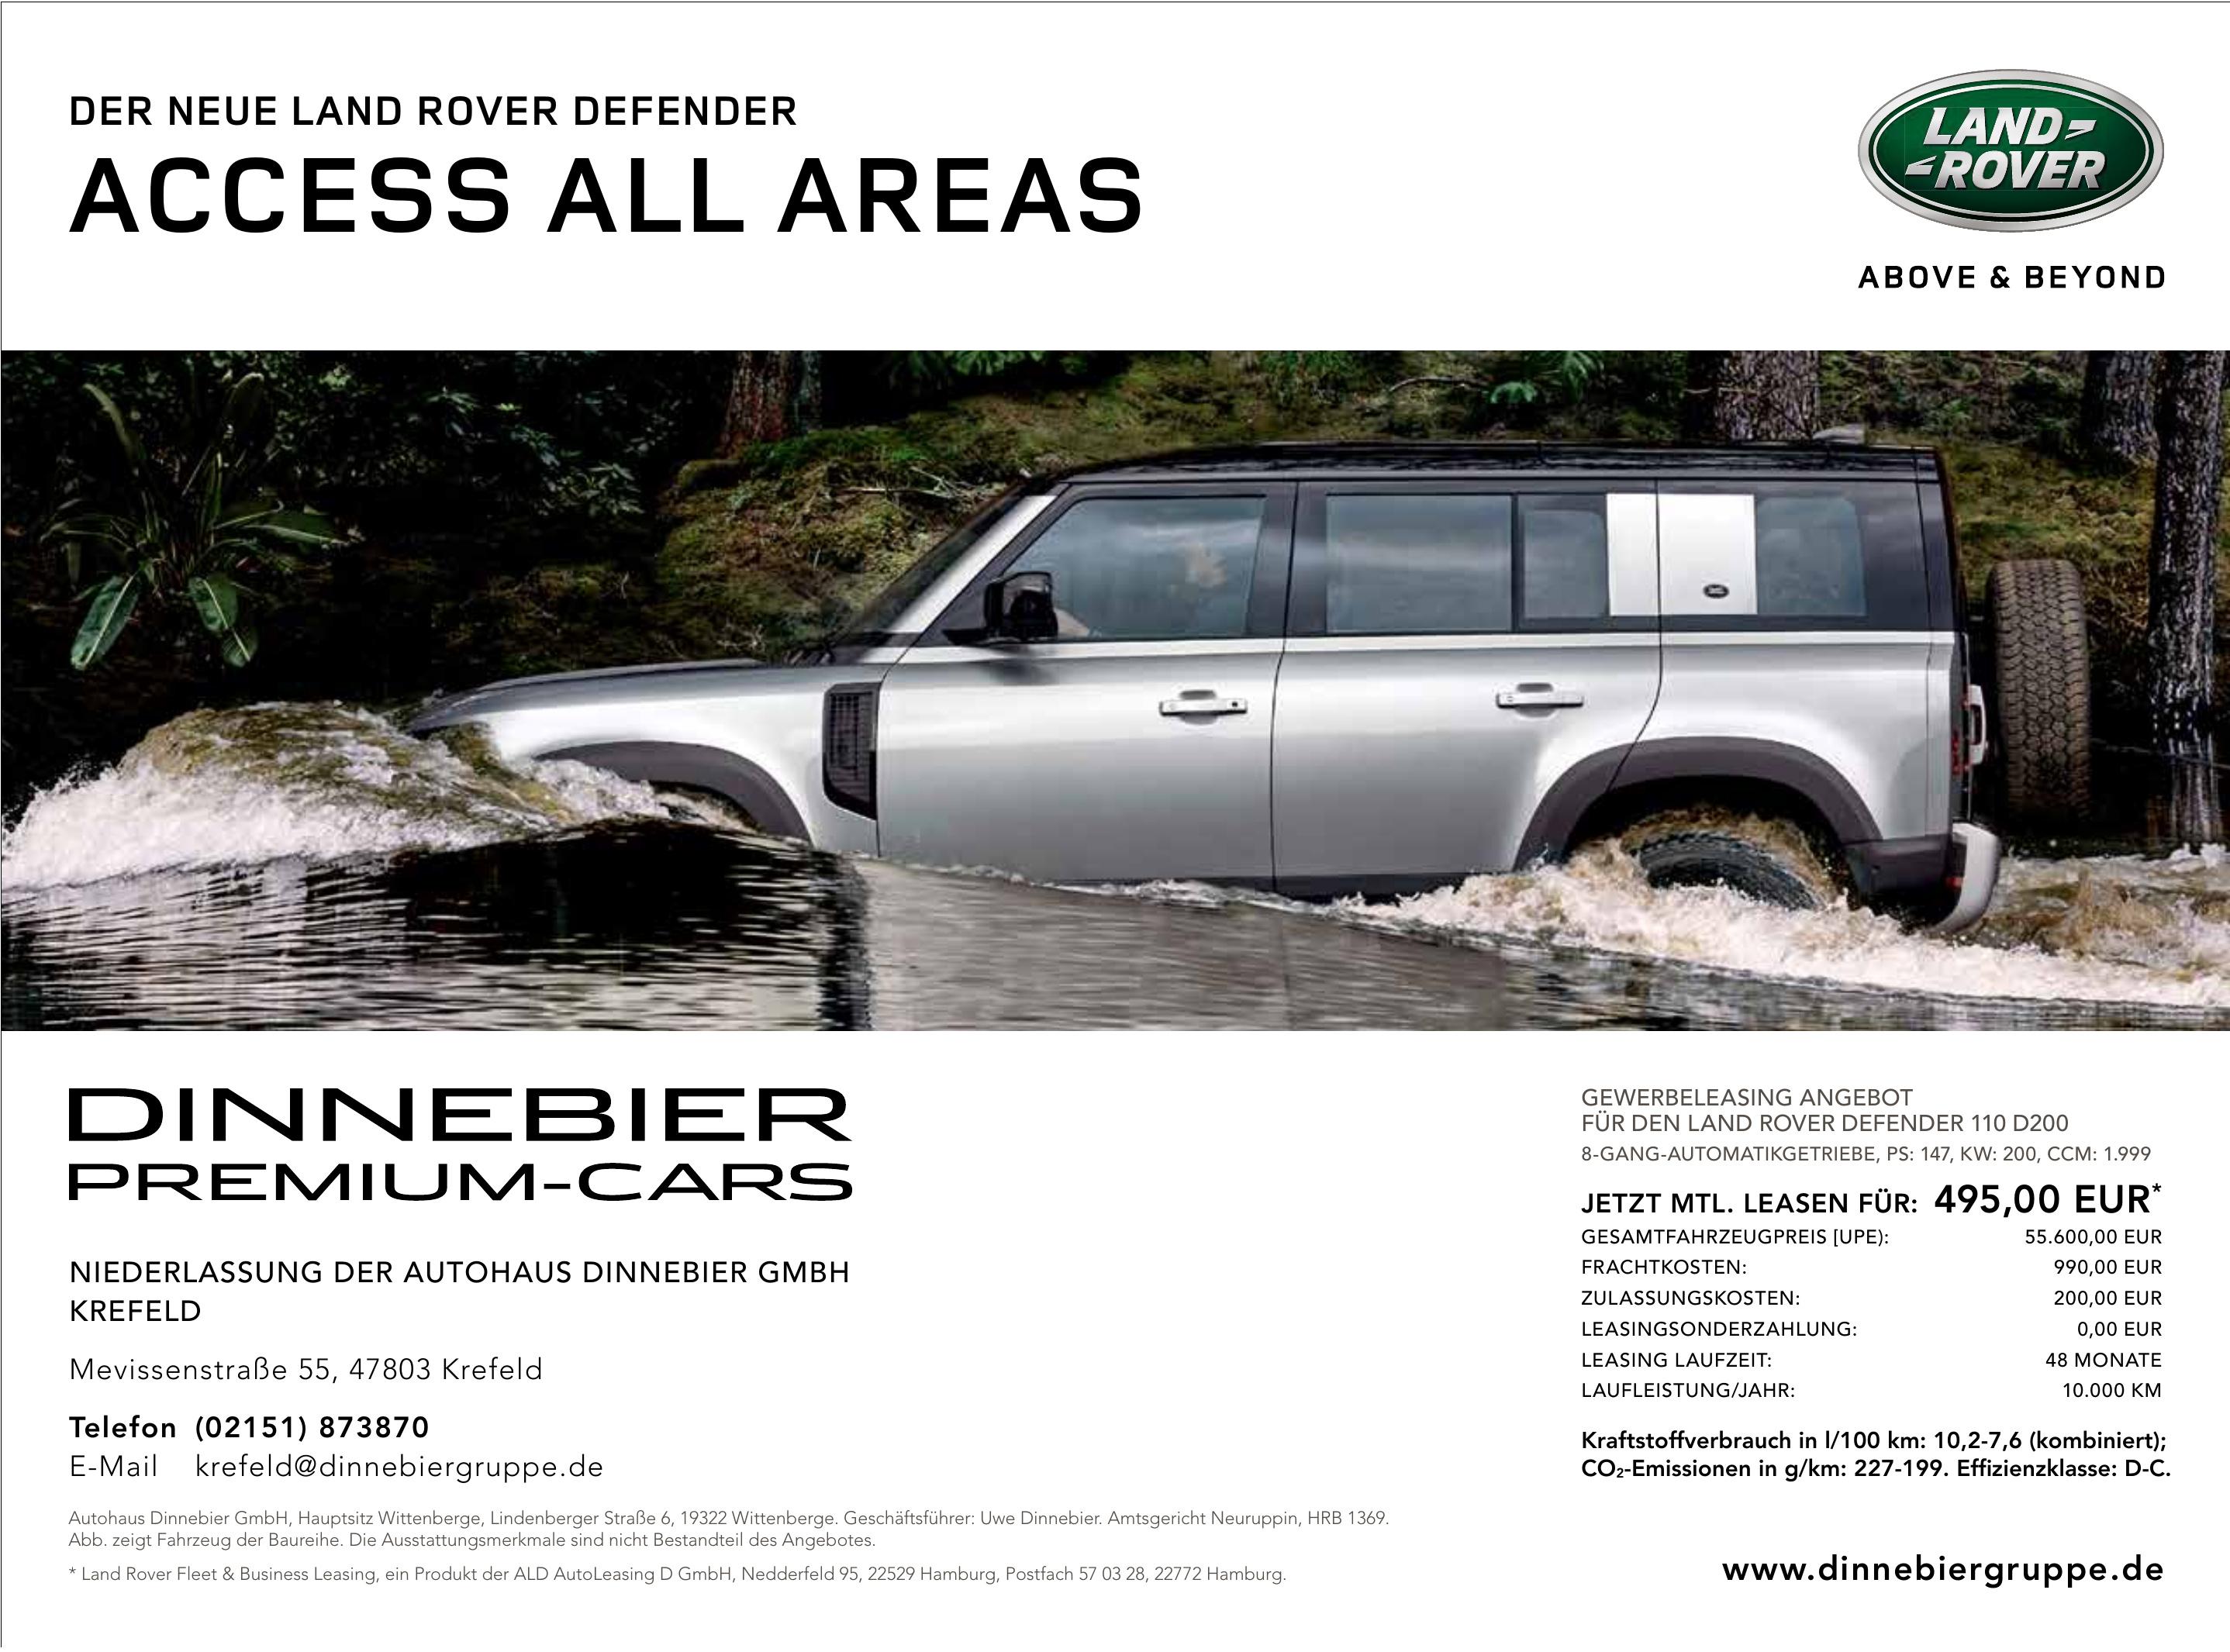 Dinnebier Premium-Cars GmbH